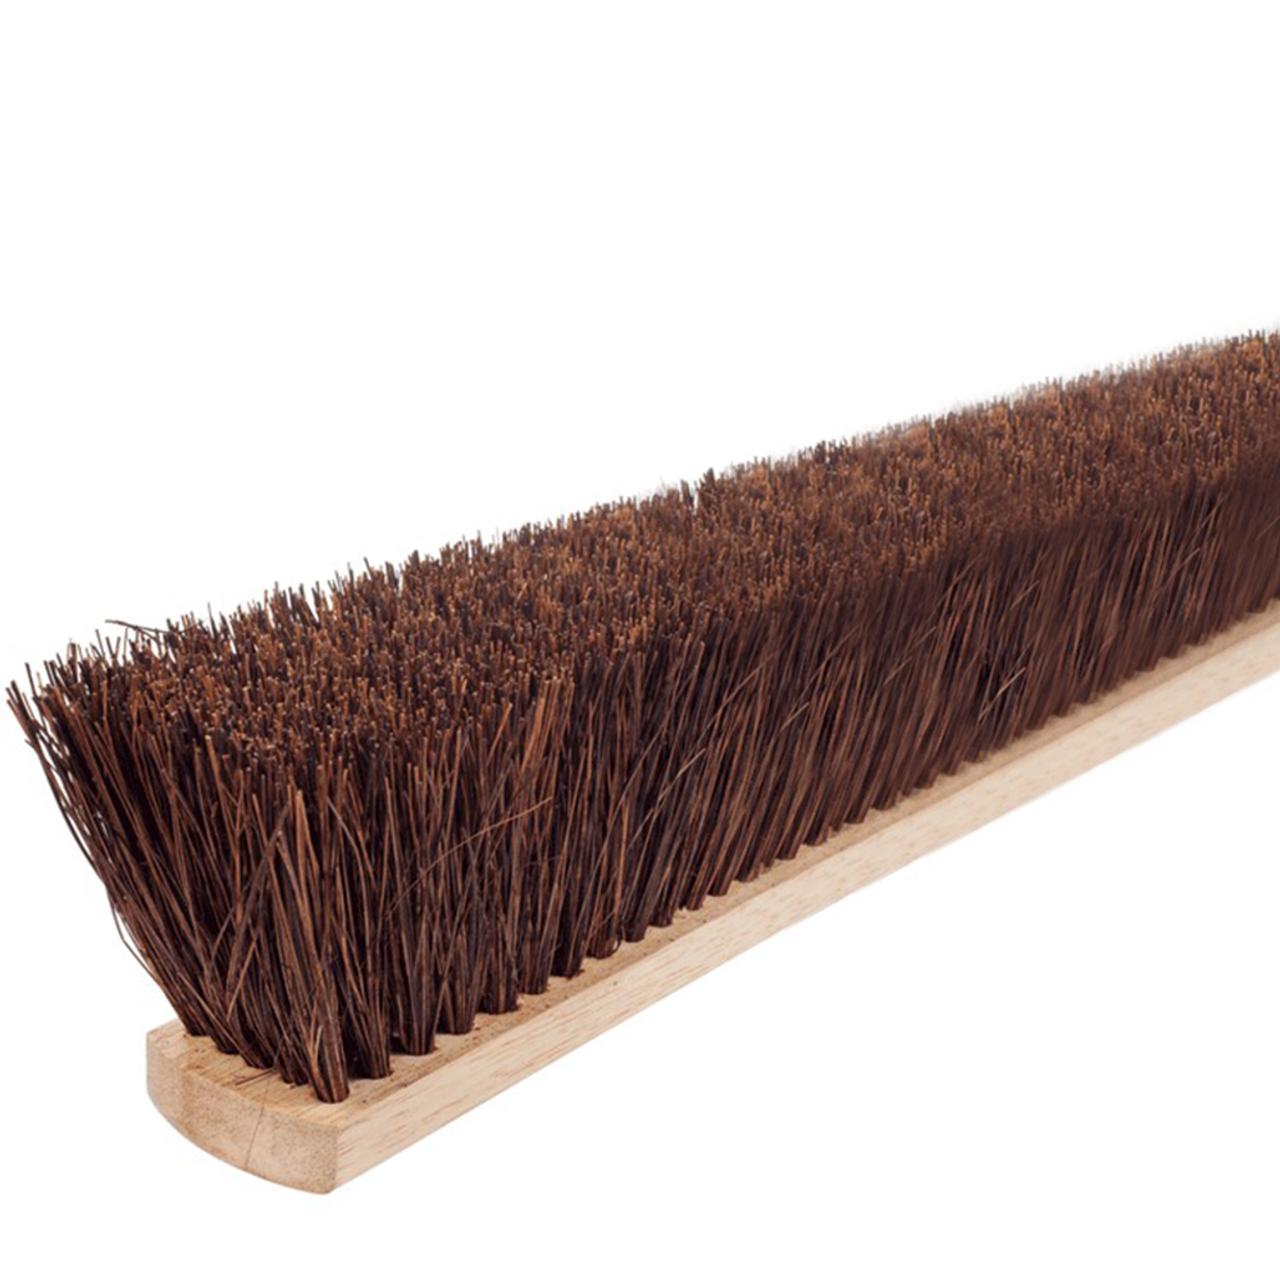 "24"" Prime Stiff Palmyra Broom - MAG 1424-A"